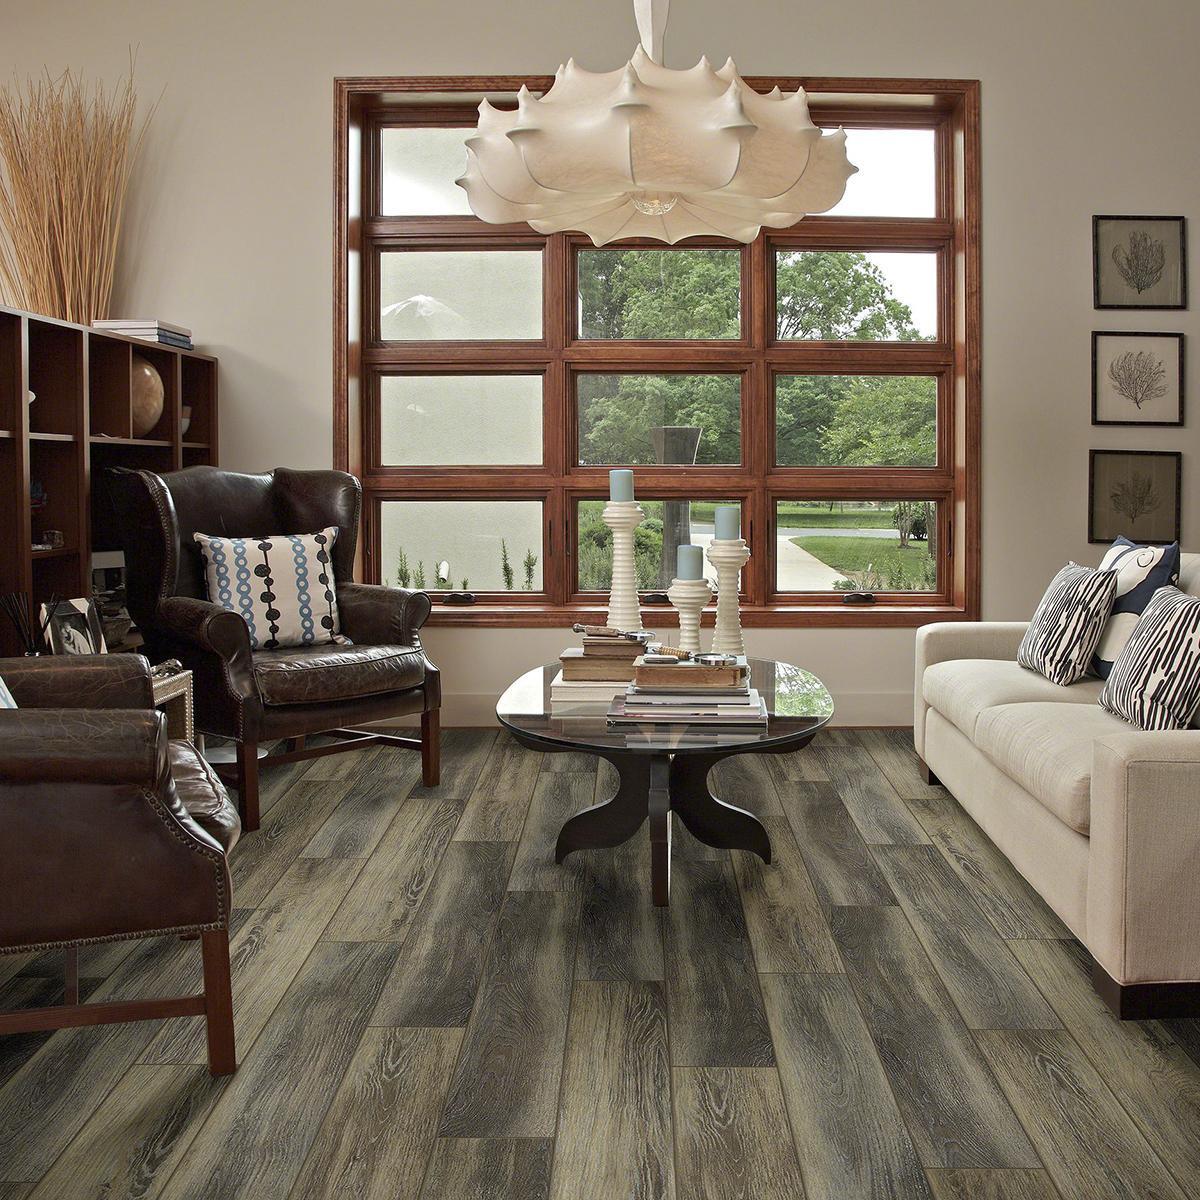 dallas hardwood floor cleaning of shaw tivoli plus sabbia 7 x 48 luxury vinyl tile nebraska inside product image 0 product image 1